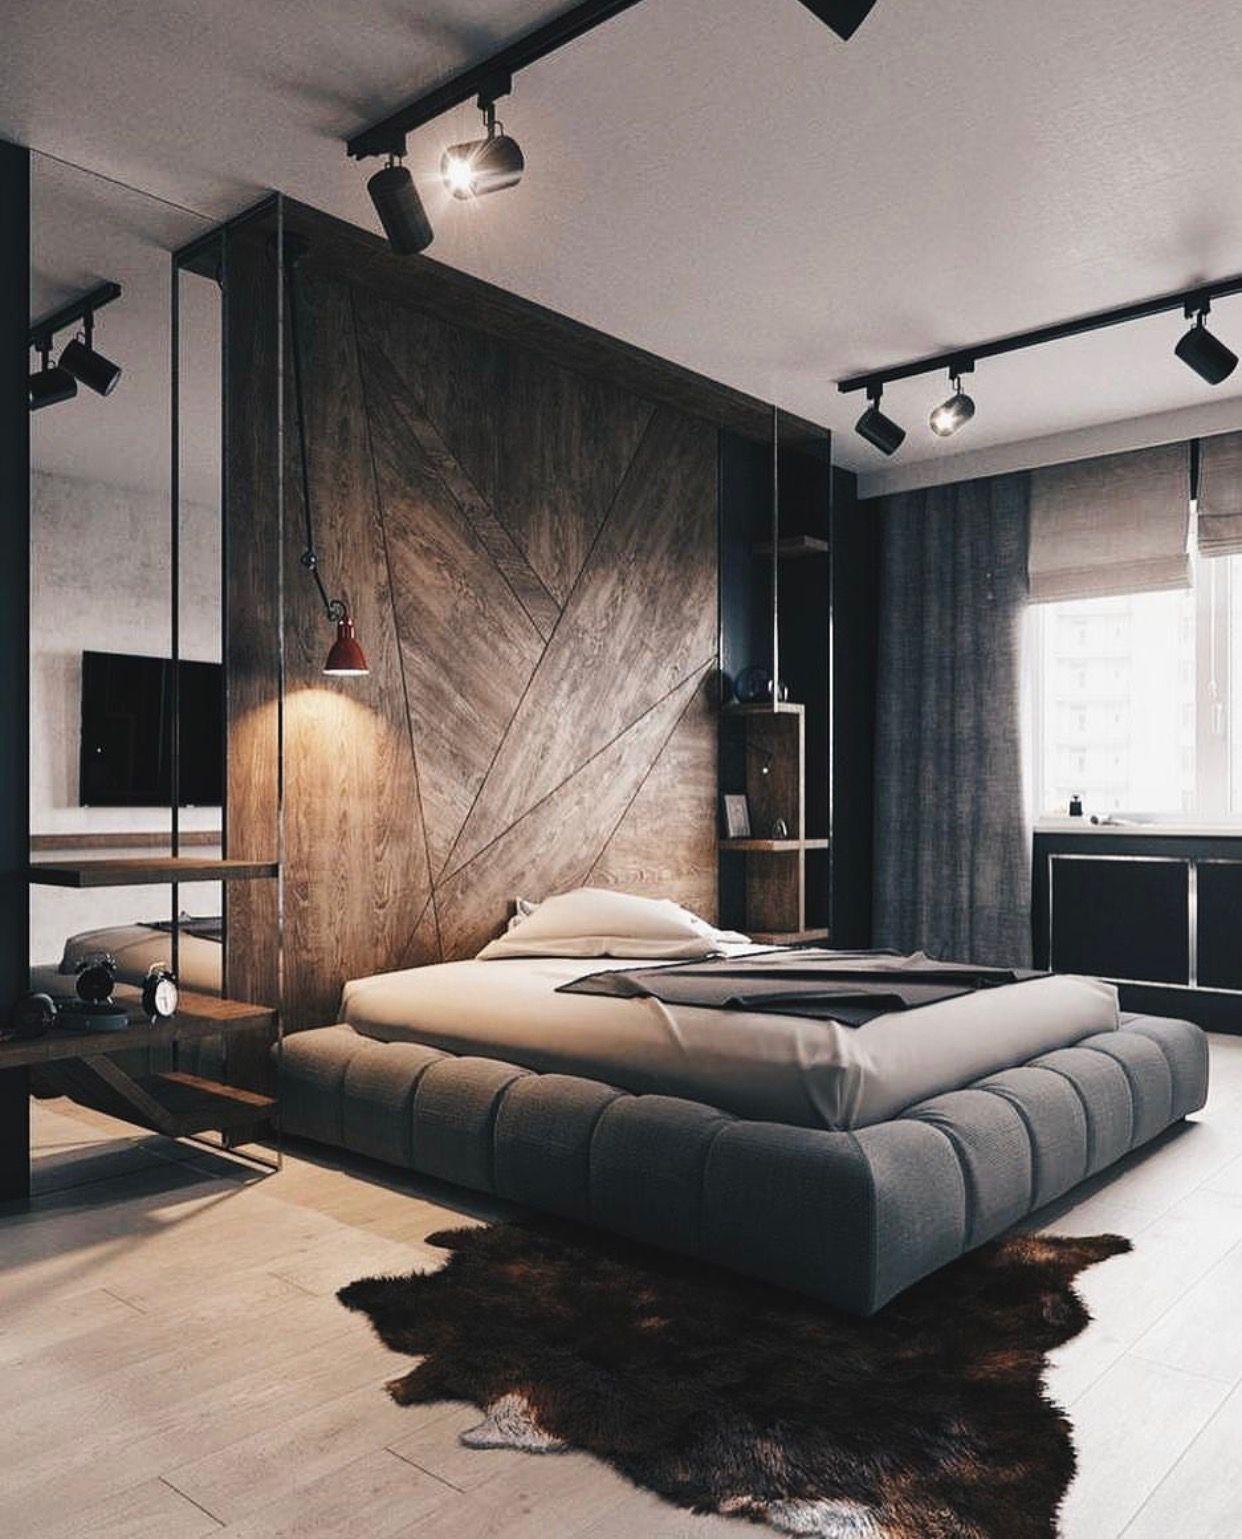 AMAZING LUXURY HOTEL BEDROOMS TO INSPIRE YOUR